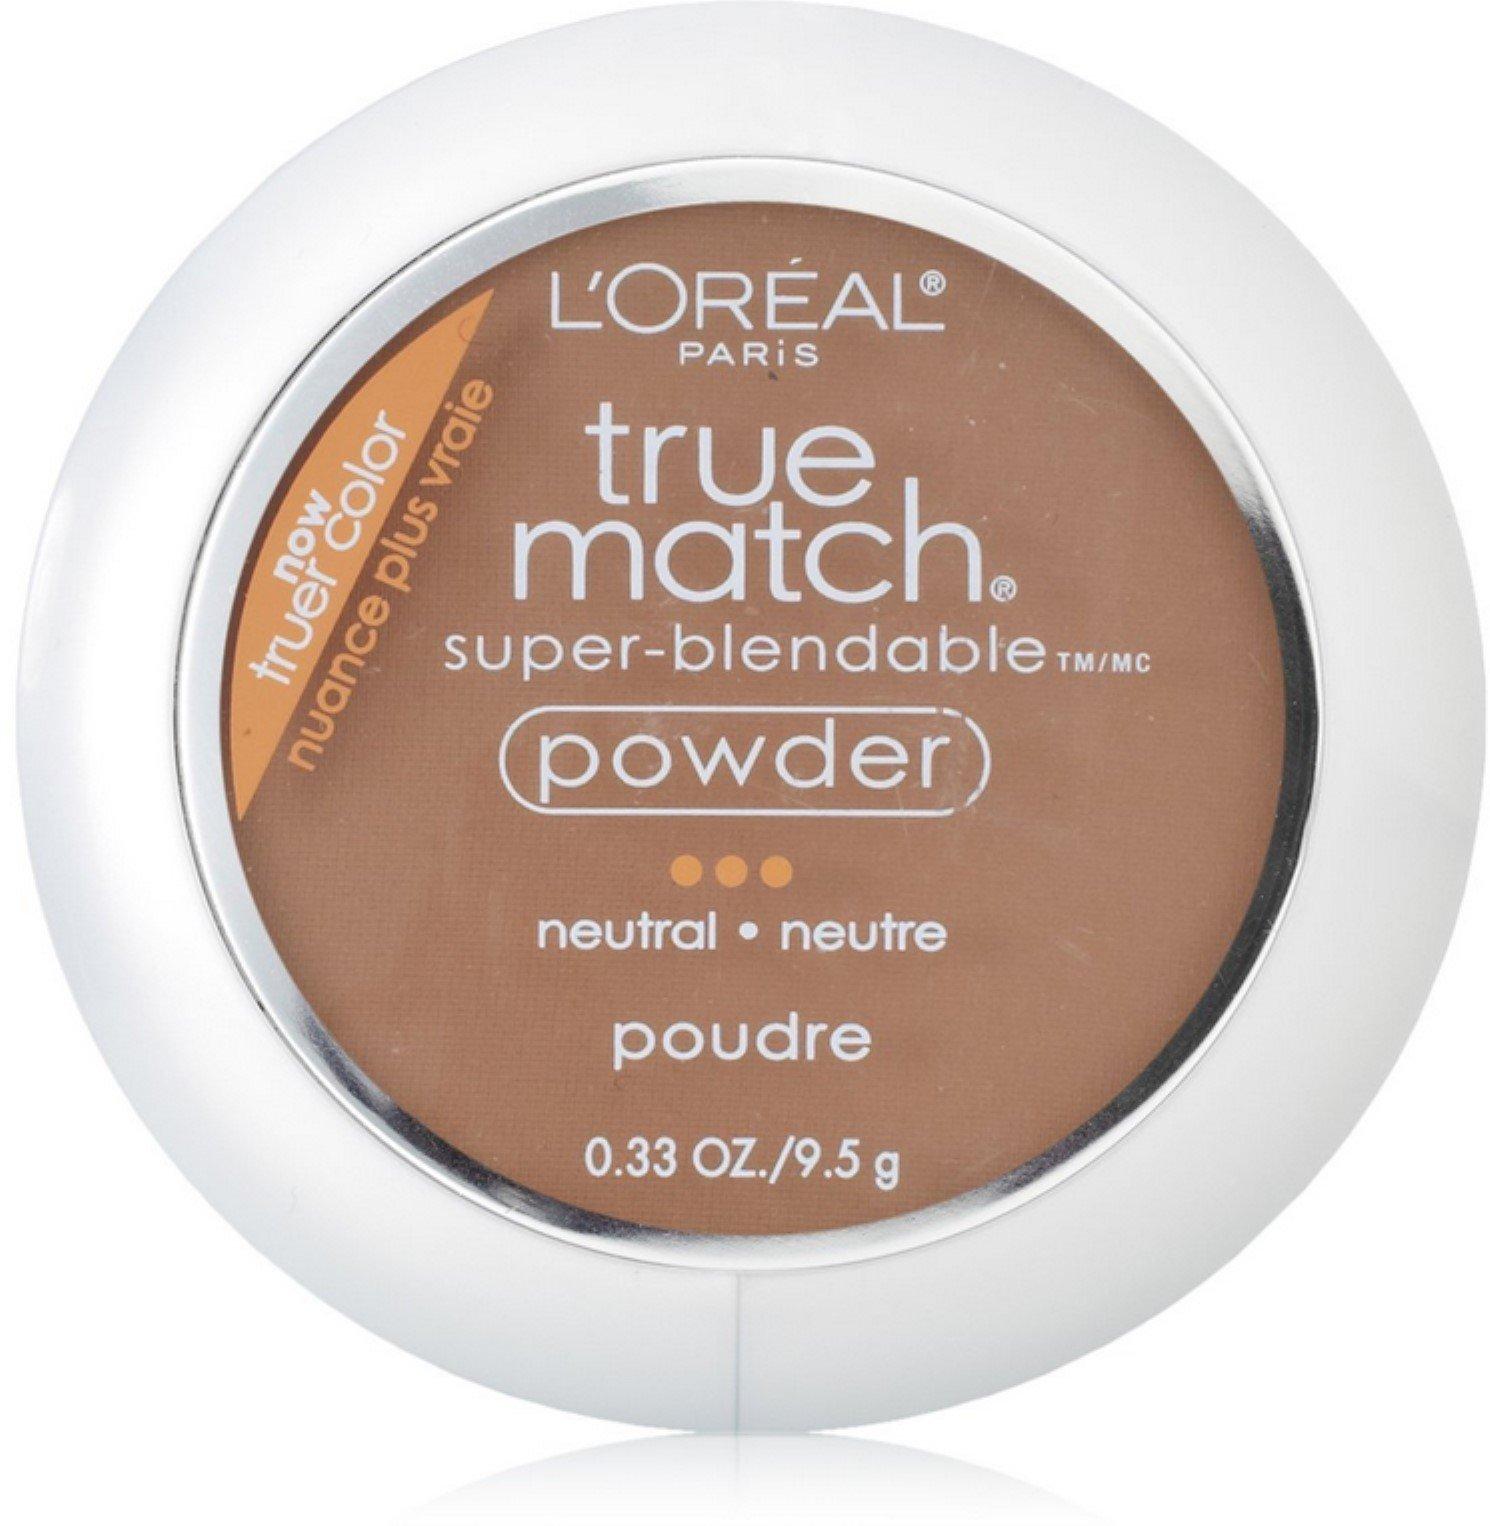 L'Oreal True Match Powder, Cappuccino [N8], 0.33 oz (Pack of 2)